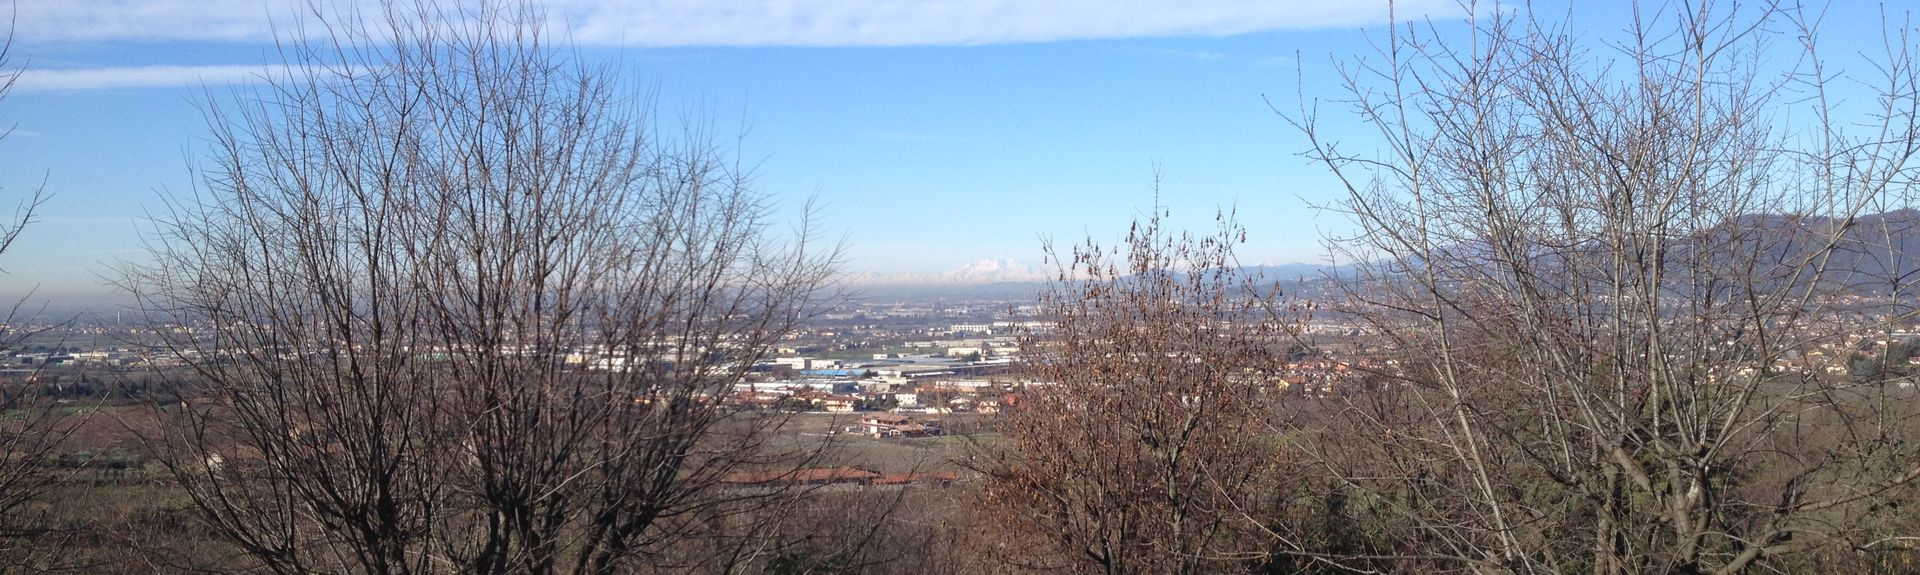 Cortenuova, Bergamo, Lombardy, Italy